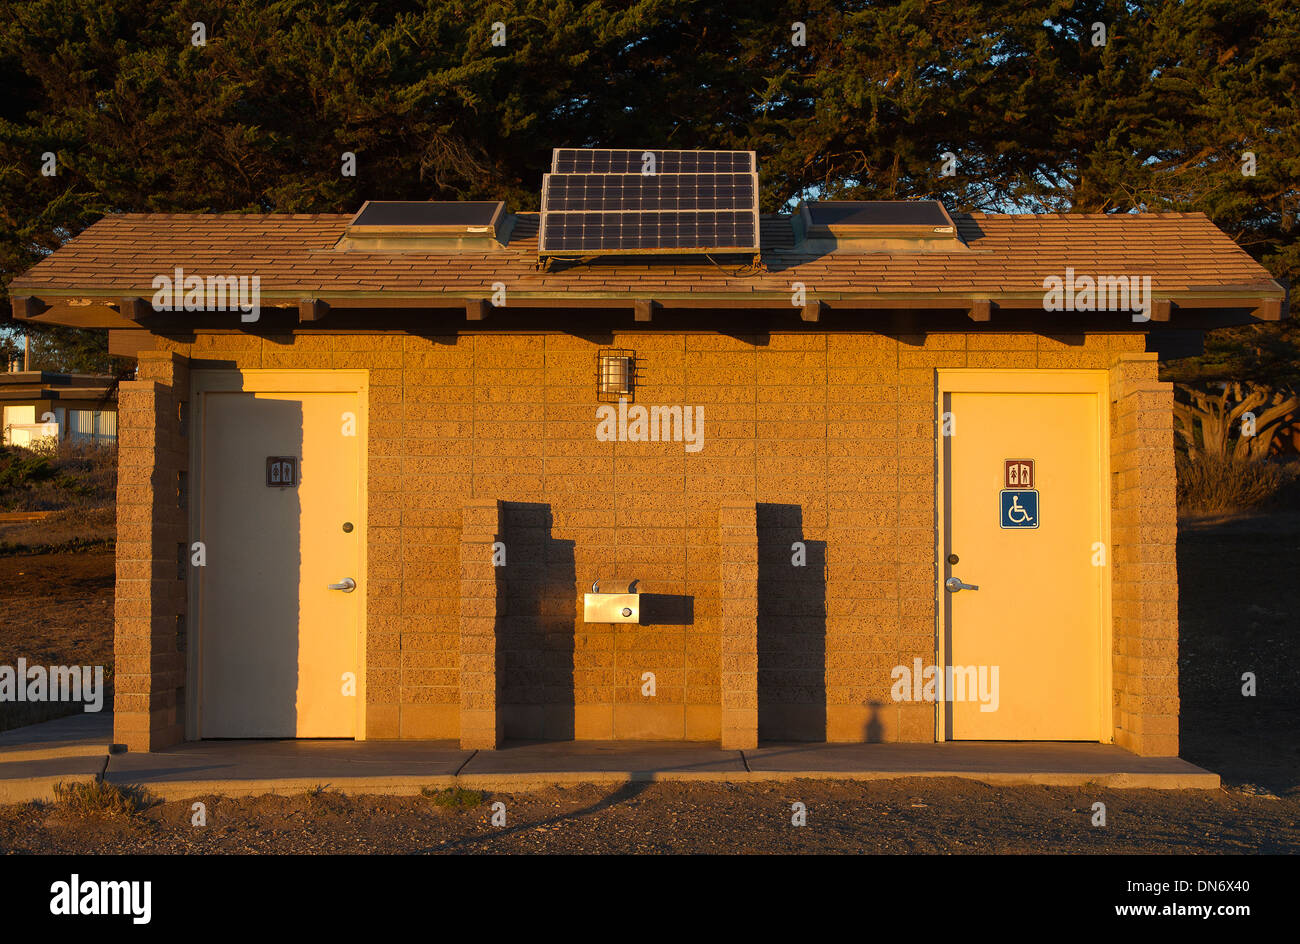 Solar Panels On Public Bathroom Stock Photo Alamy - Public bathroom wall panels